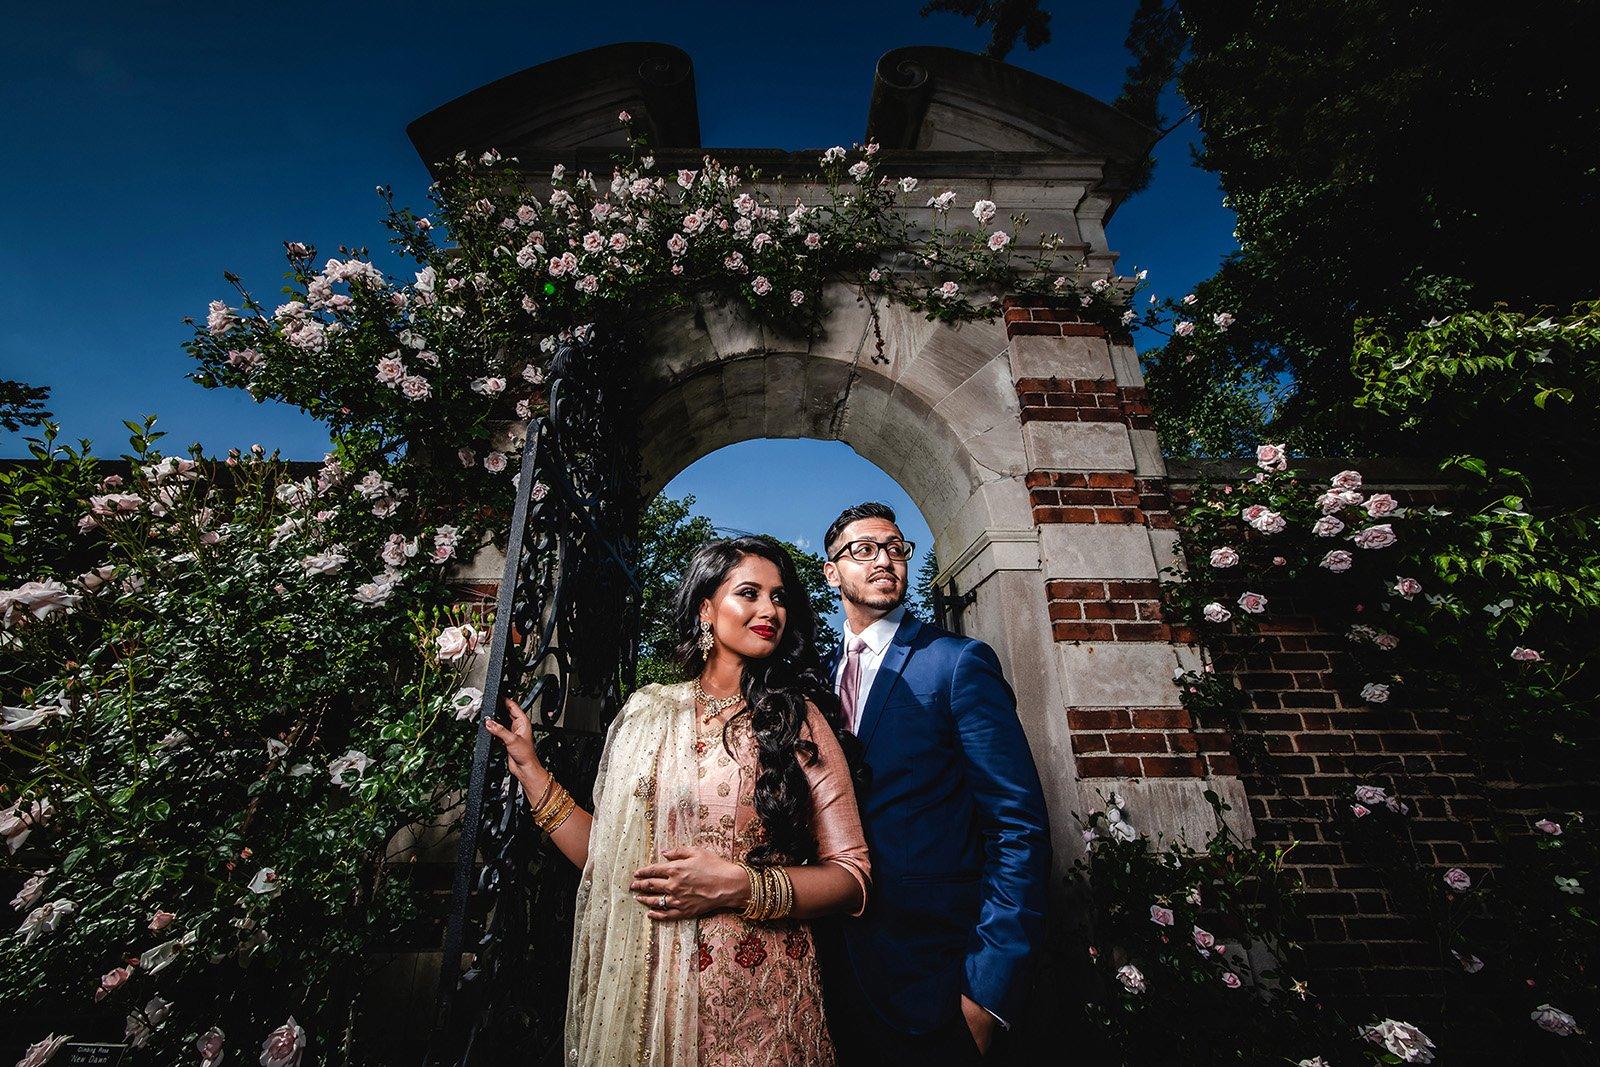 Old-Westbury-Garden-Pre-Wedding-Shoot ENGAGEMENTS